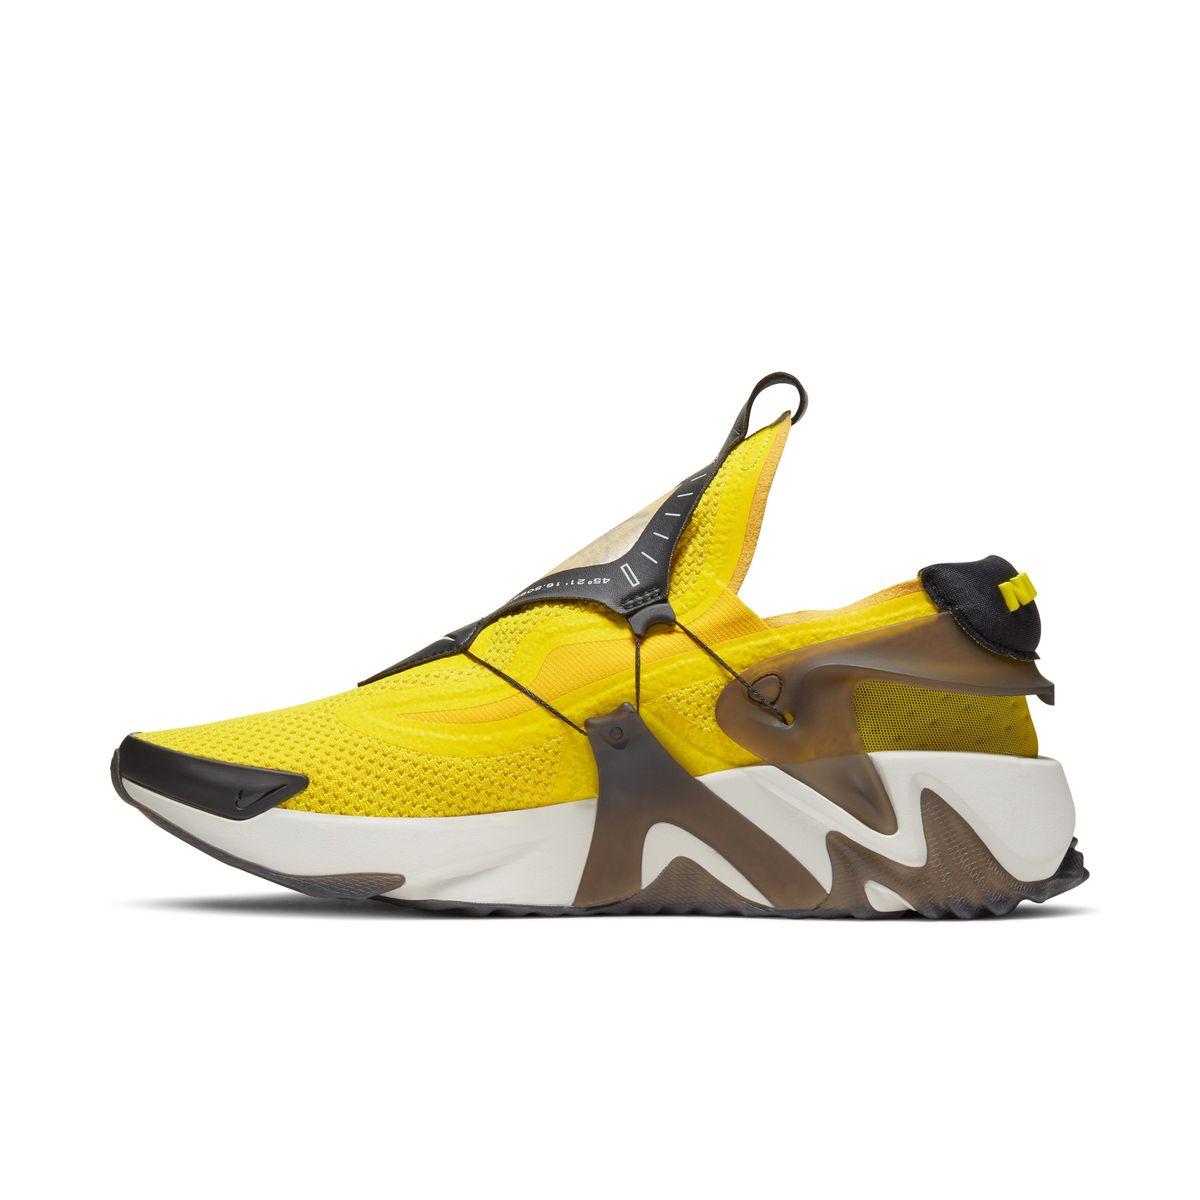 Nike — Adapt Huarache Yellow - Image 1